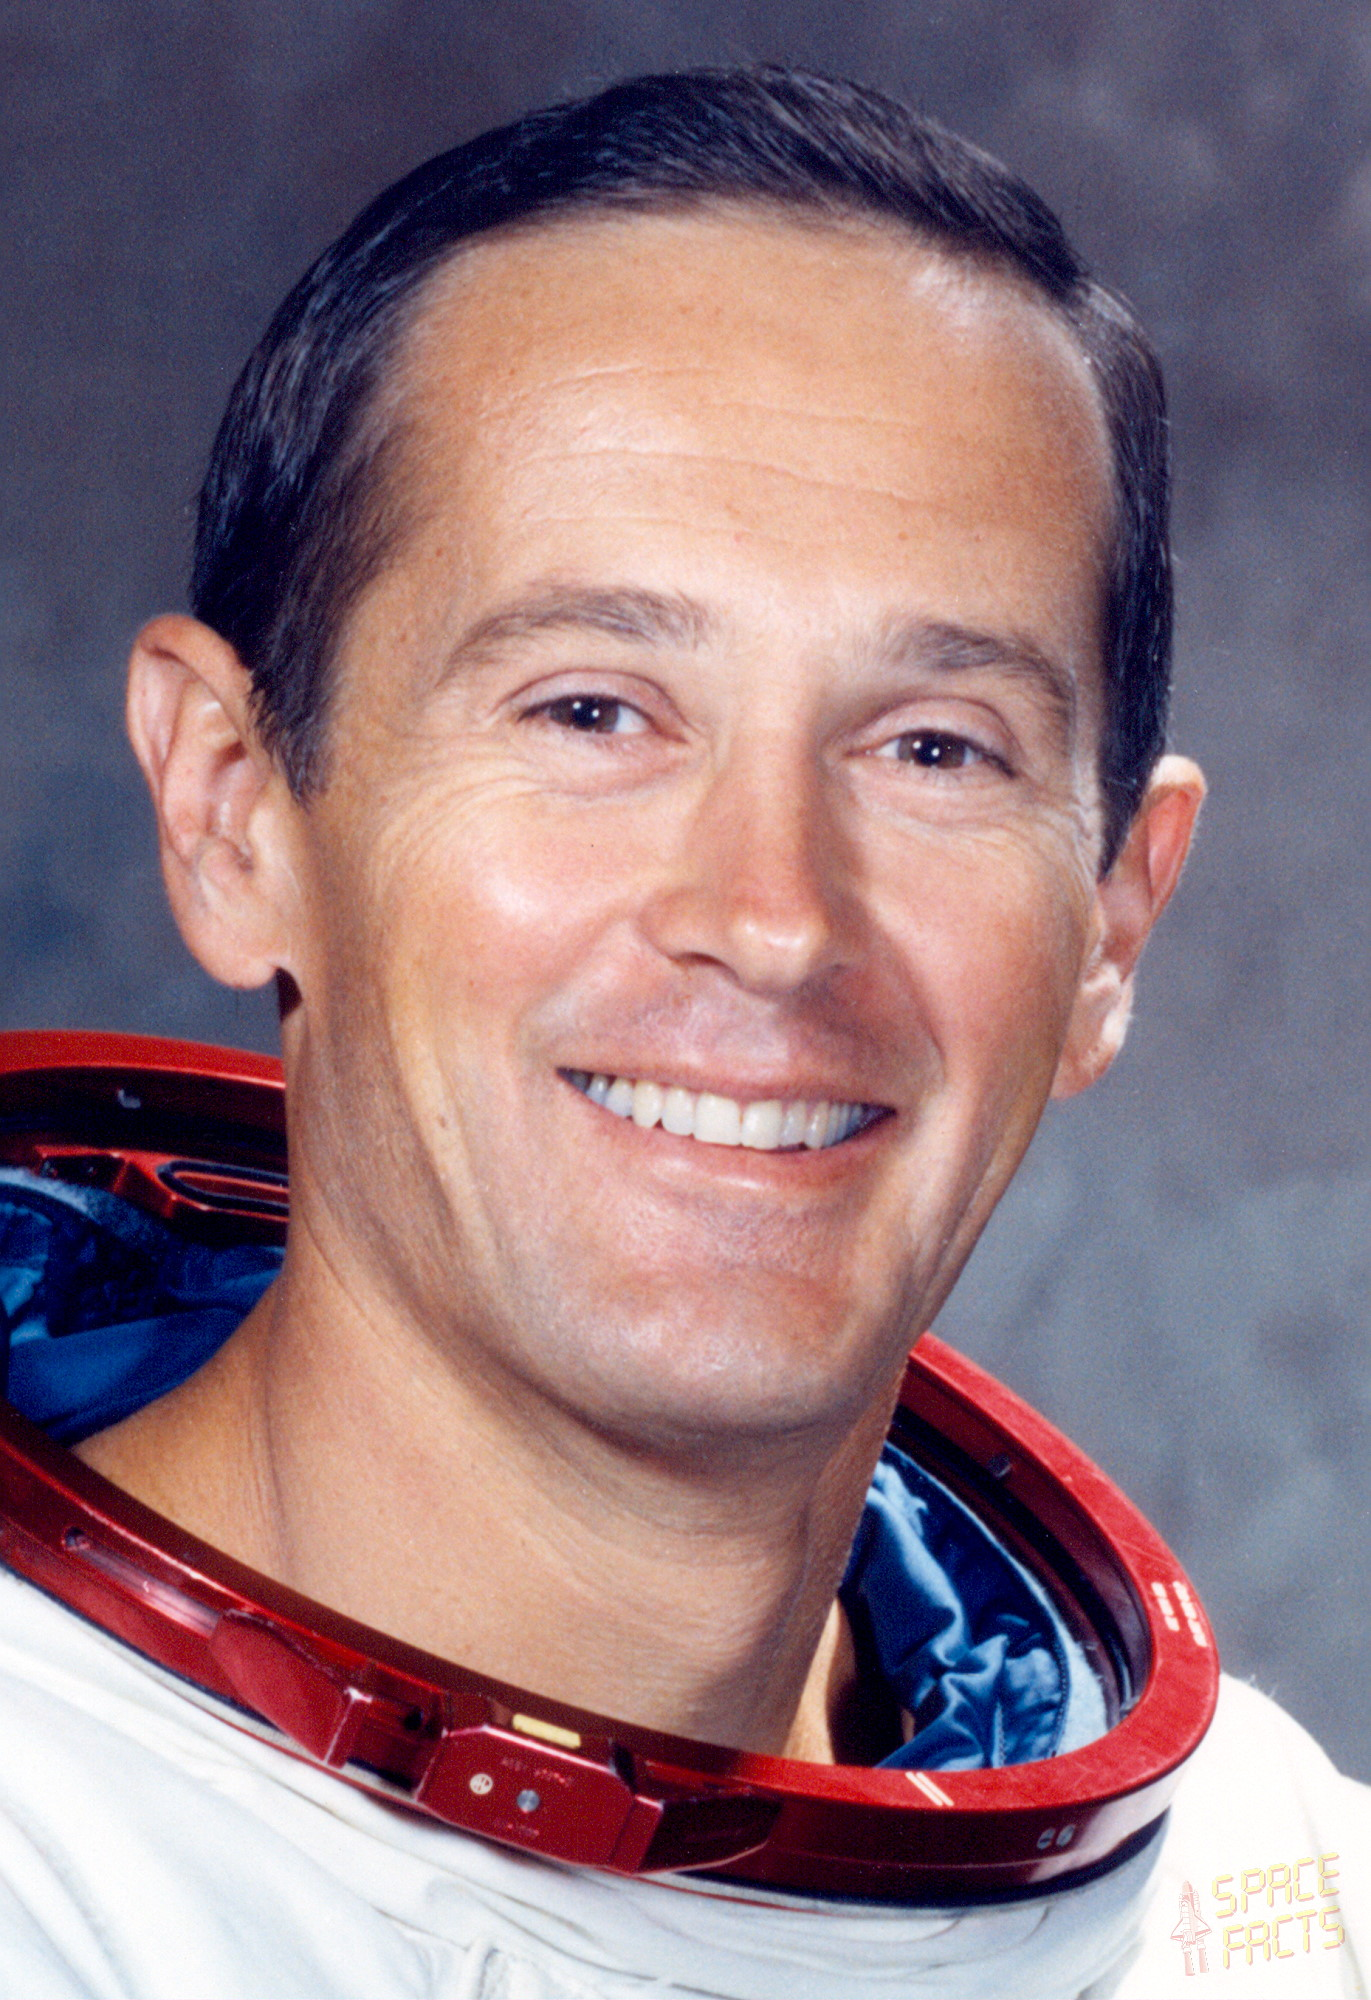 Backup Image Astronaut Biography Charles Duke